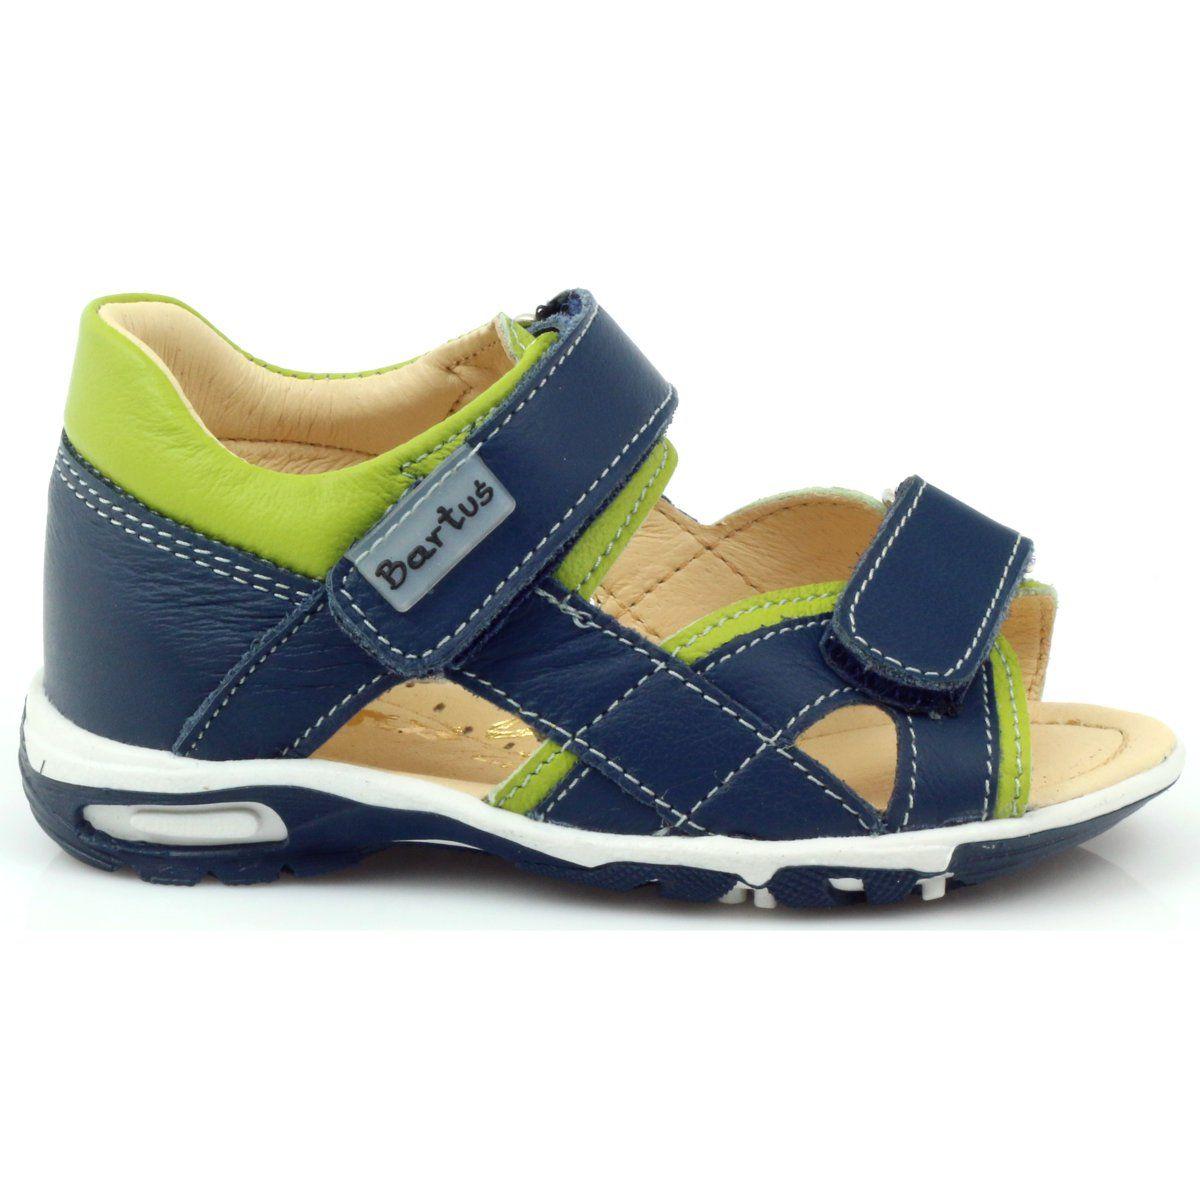 Sandalki Na Rzepy Bartus 137 Granatowe Zielone Stylish Sandals Kid Shoes Summer Shoes